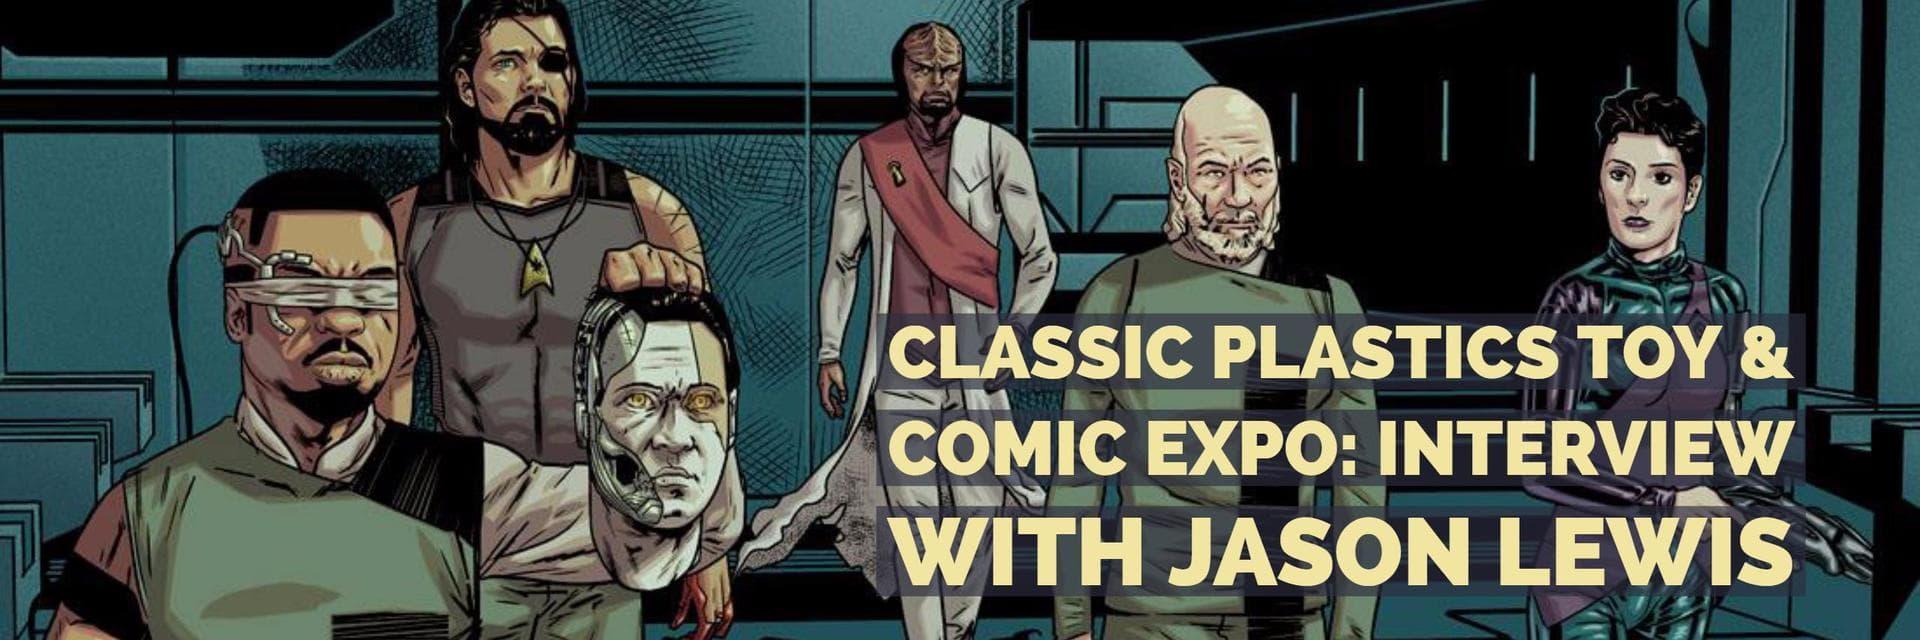 Classic Plastics Toy & Comic Expo: Interview with Jason Lewis